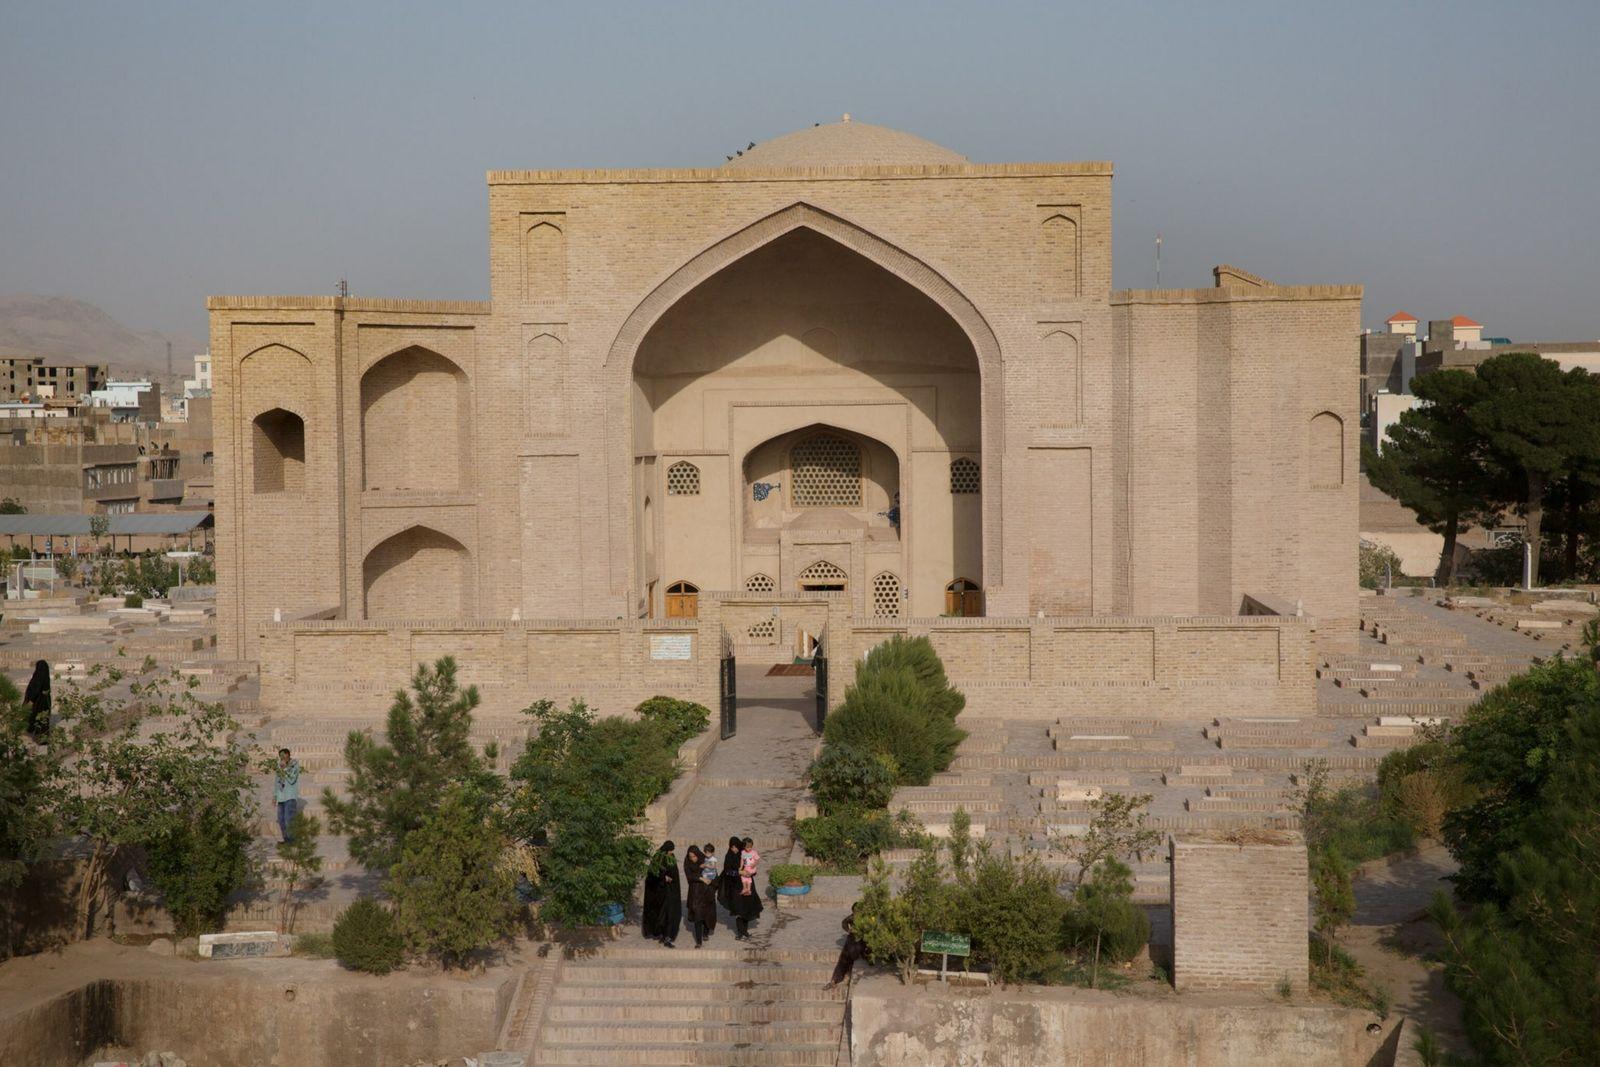 The Restored Shahzada Abdullah Mausoleum In Herat, Afghanistan